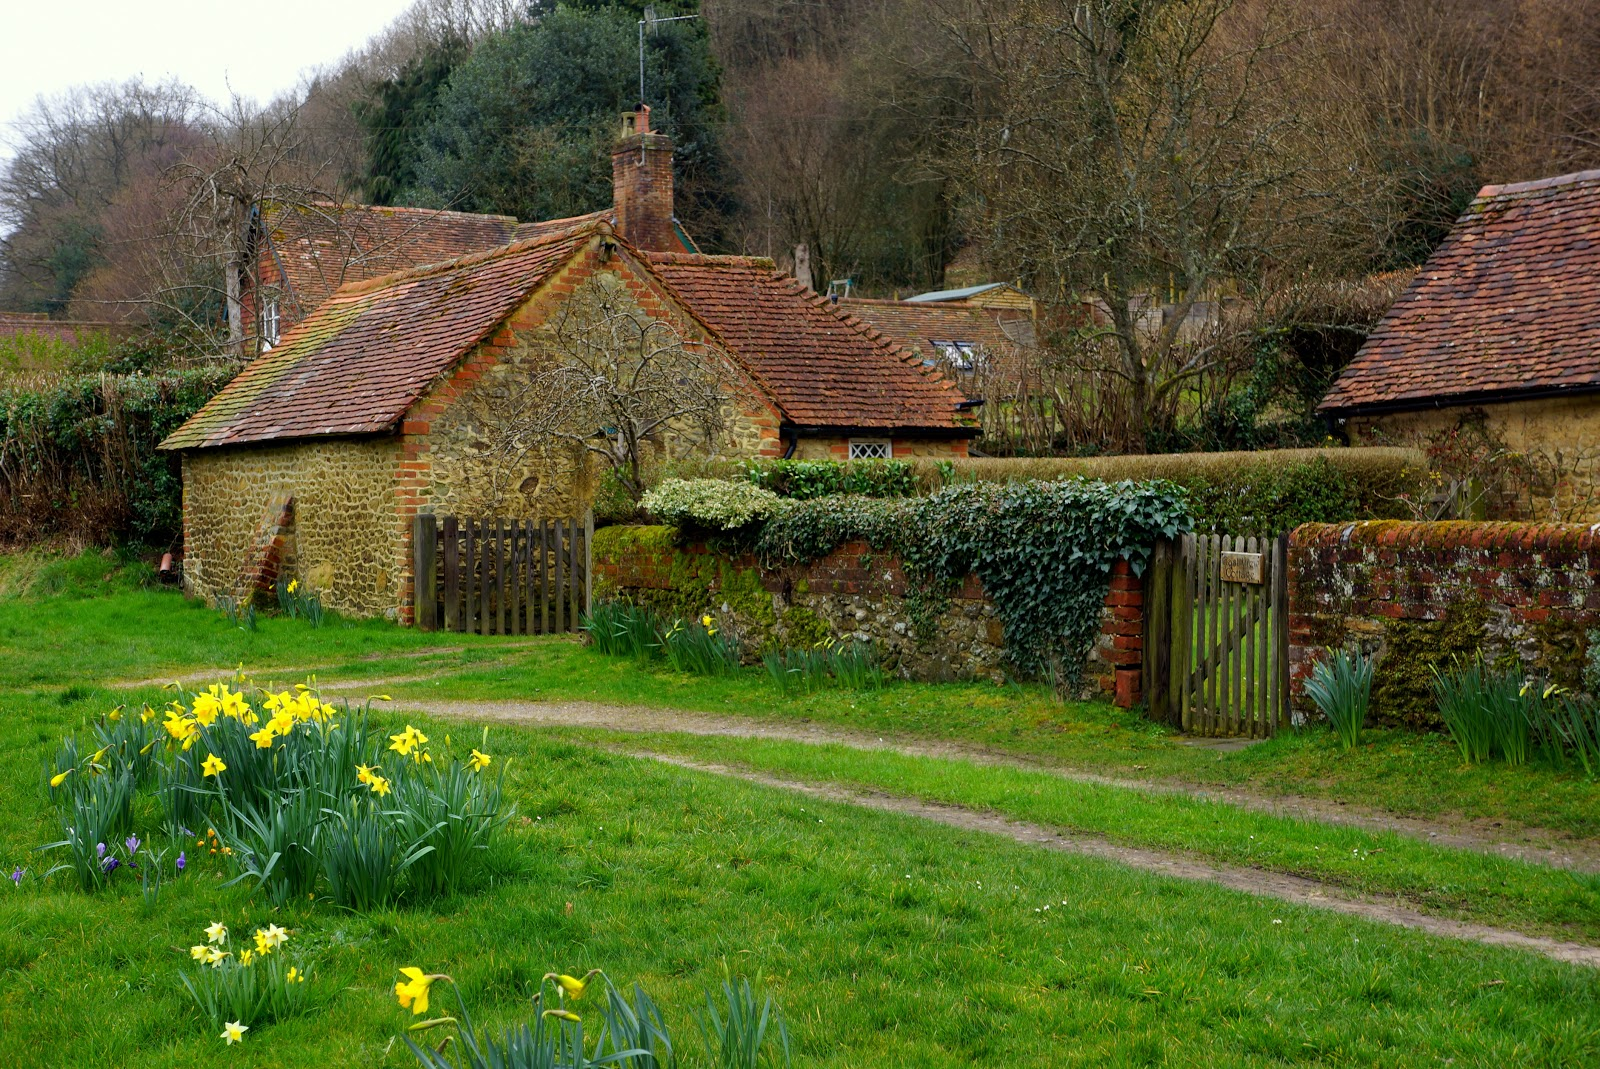 Rural English daffodils in spring